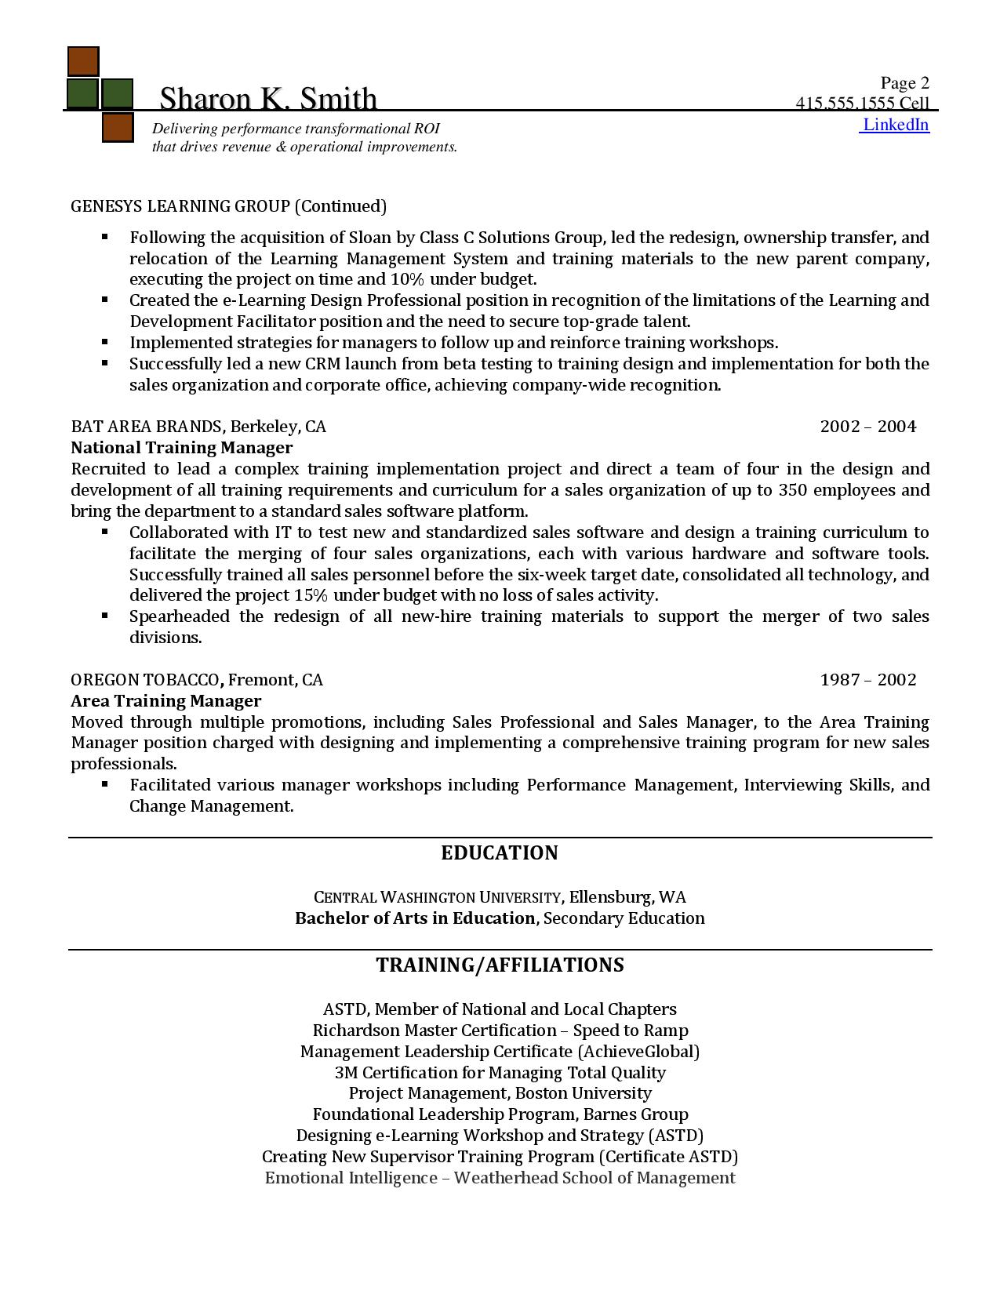 Instructional Designer Pg 2 Resume services, Executive